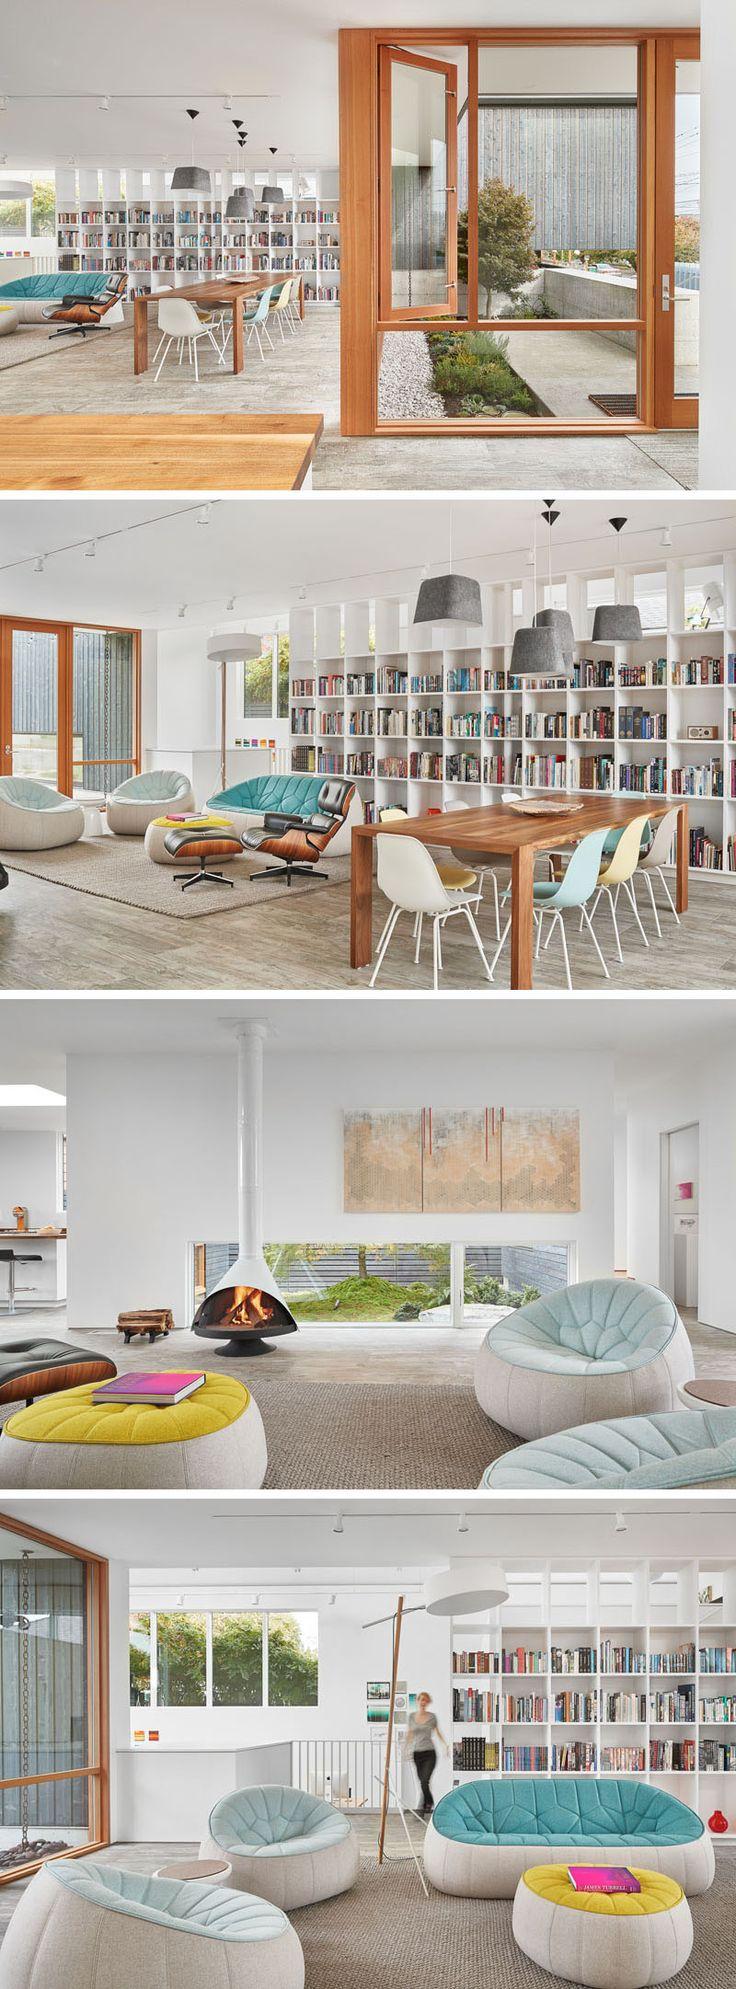 The 25 best Comfortable sofa ideas on Pinterest Modular living